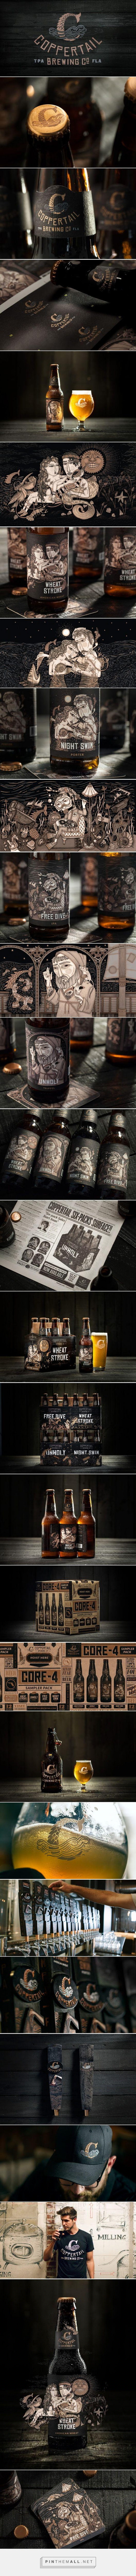 COPPERTAIL Brewing Co. Branding System   Fivestar Branding – Design and Branding Agency & Inspiration Gallery